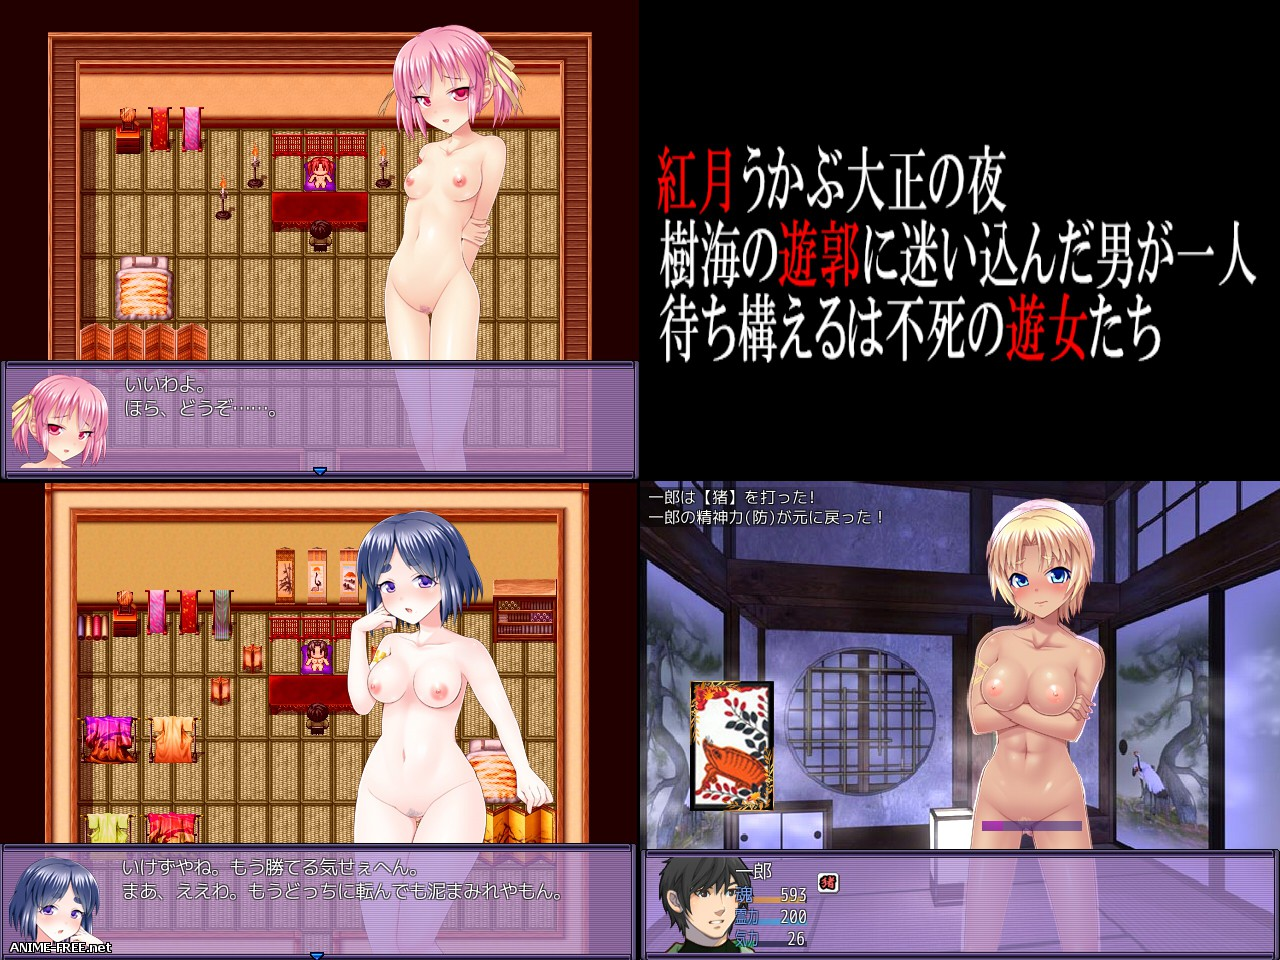 Jukai no Kuruwa ~Red Moon Elegy~ [2016] [Cen] [jRPG] [JAP] H-Game